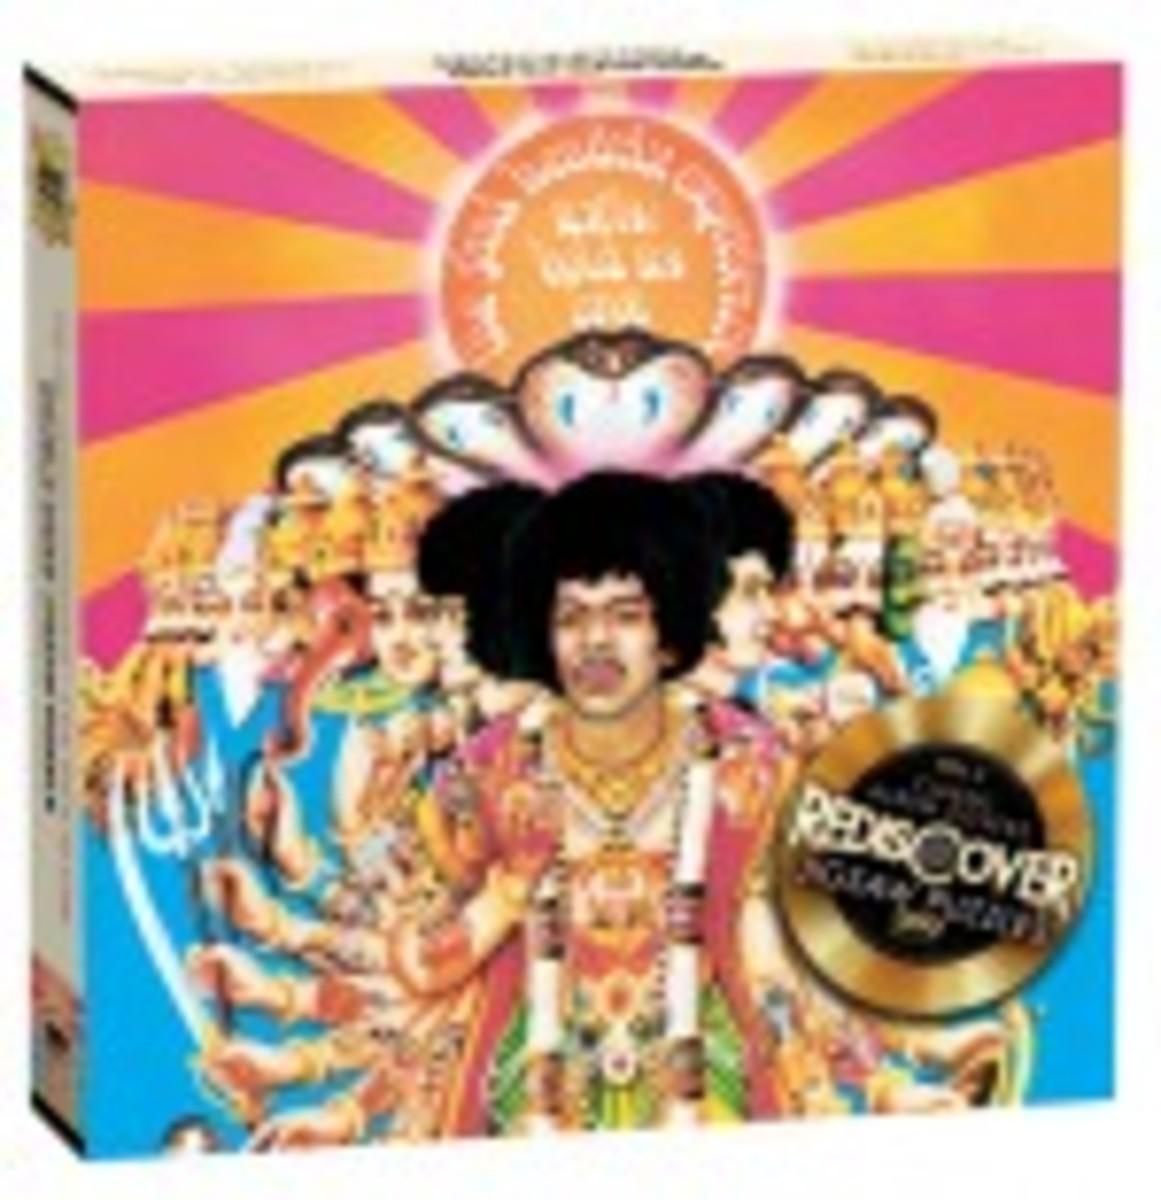 6134_Jimi Hendrix_WEB